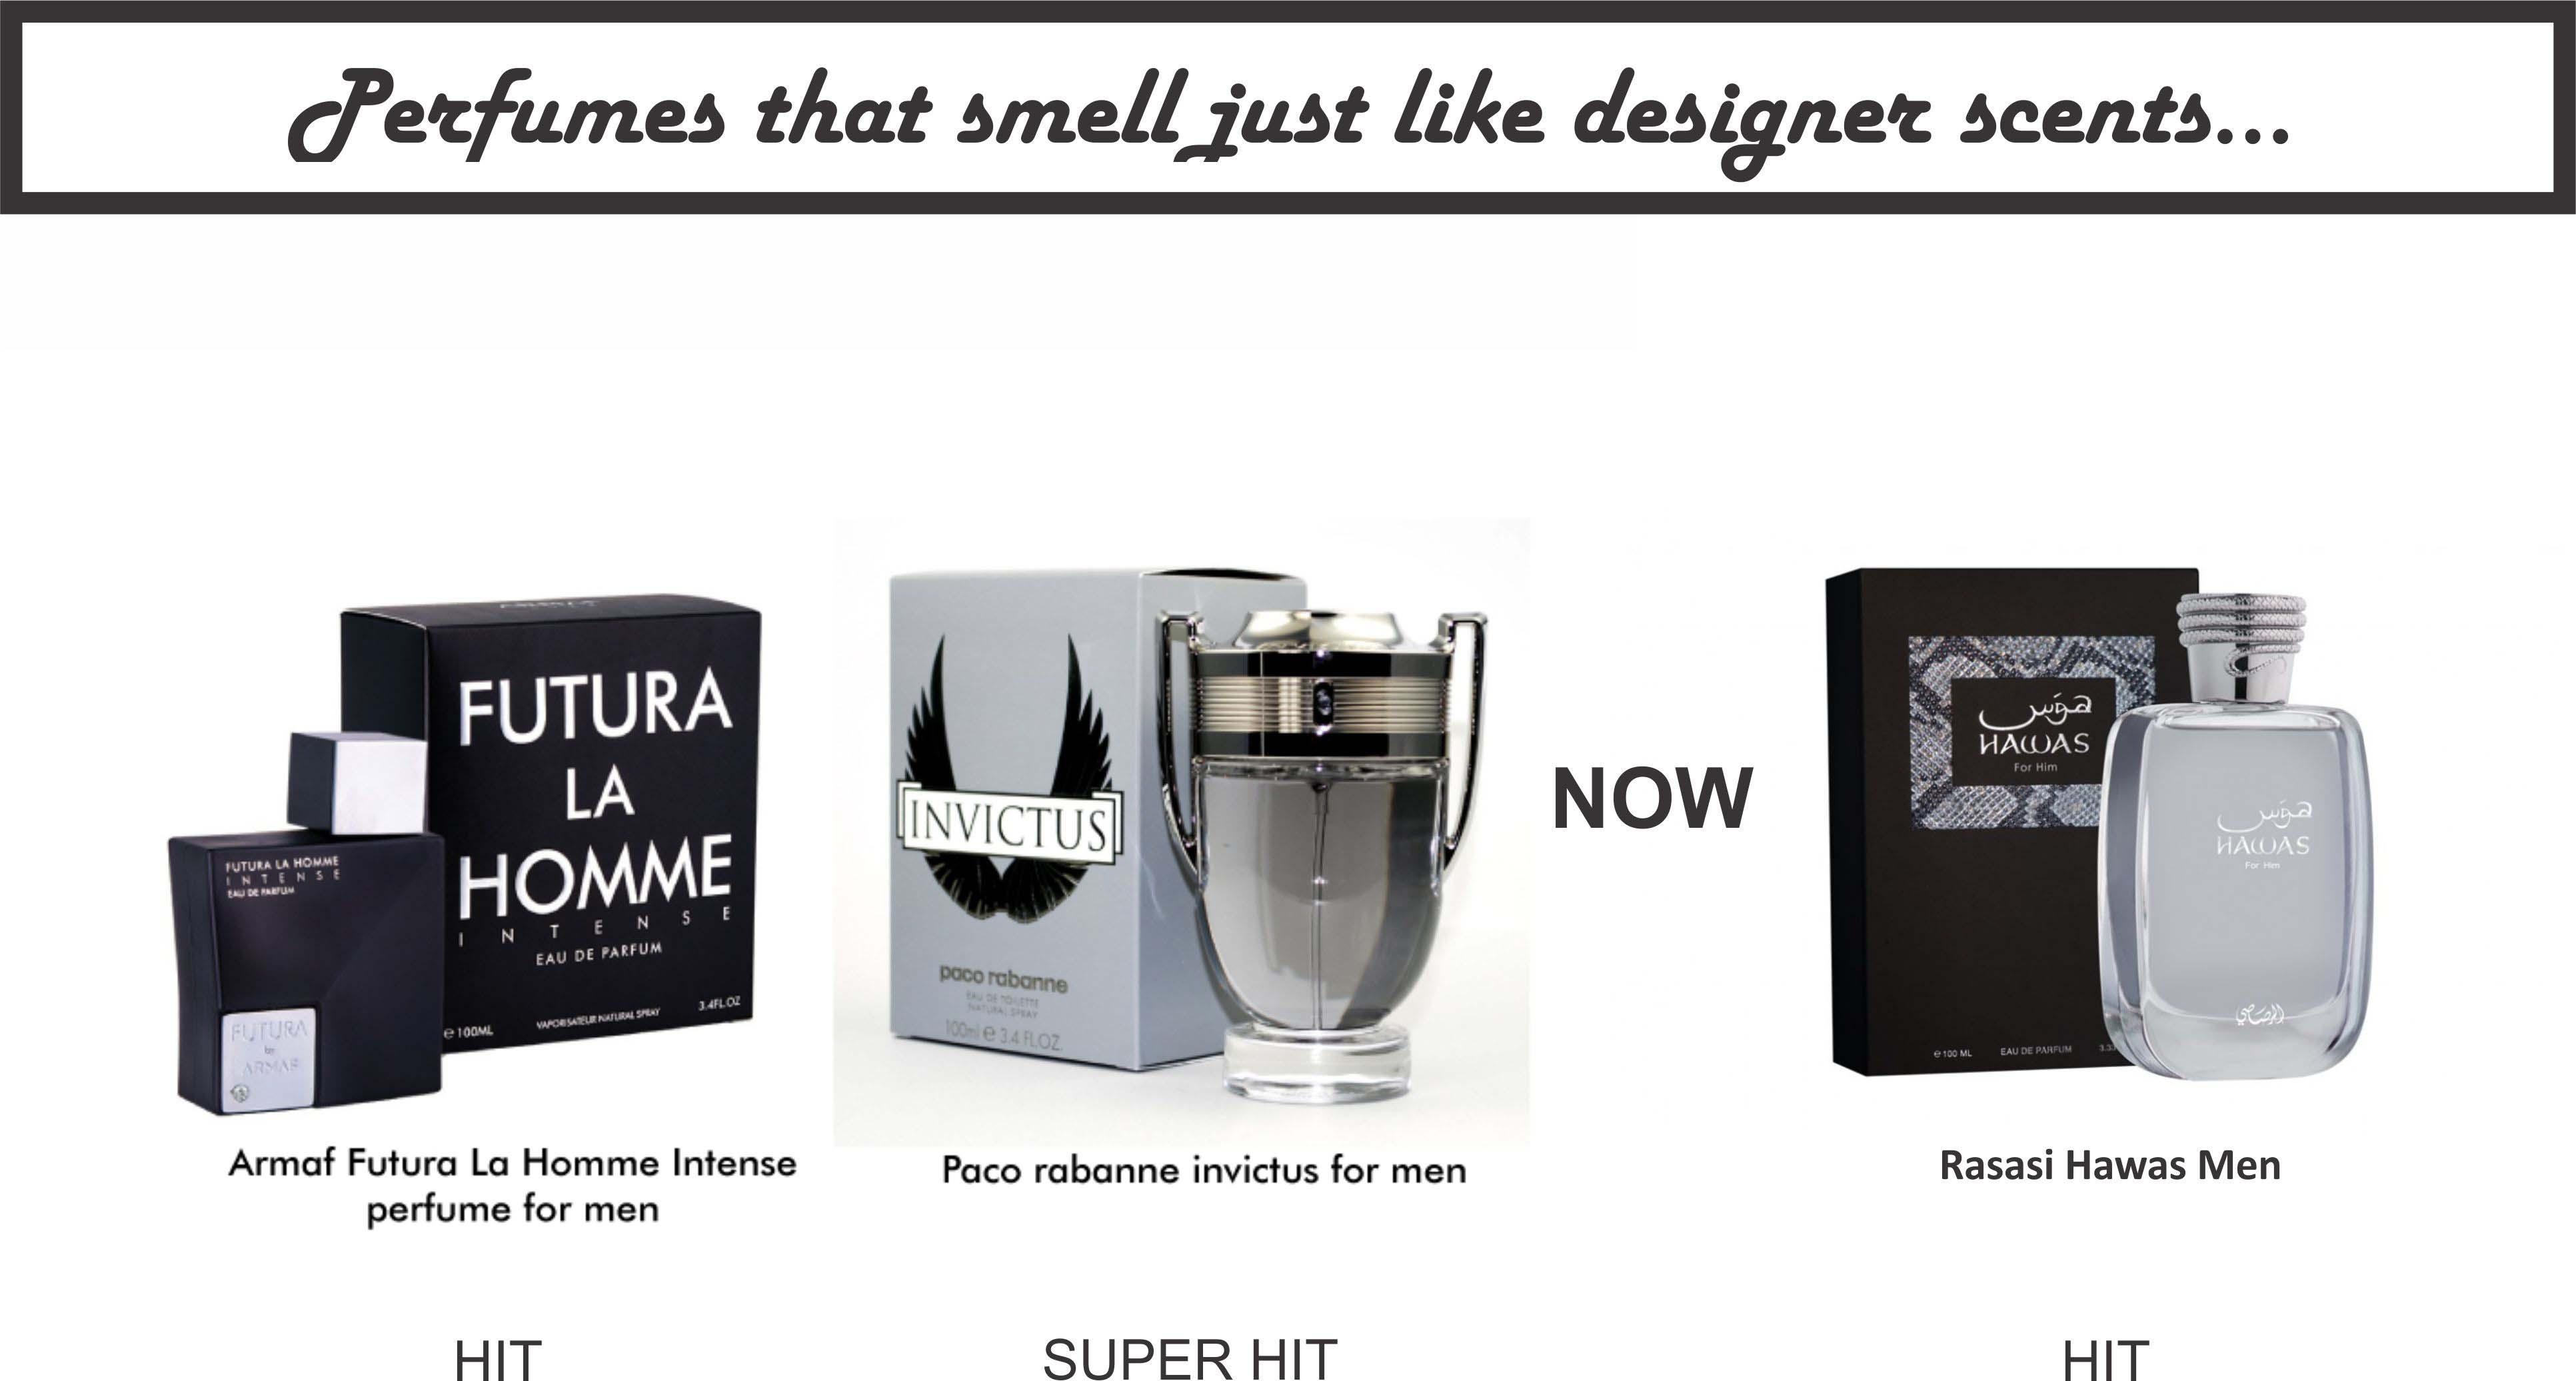 armaf-futura-la-homme-intense-perfume-paco-rabanne-invictus-rasasi-dareej-pour-homme-perfume-men